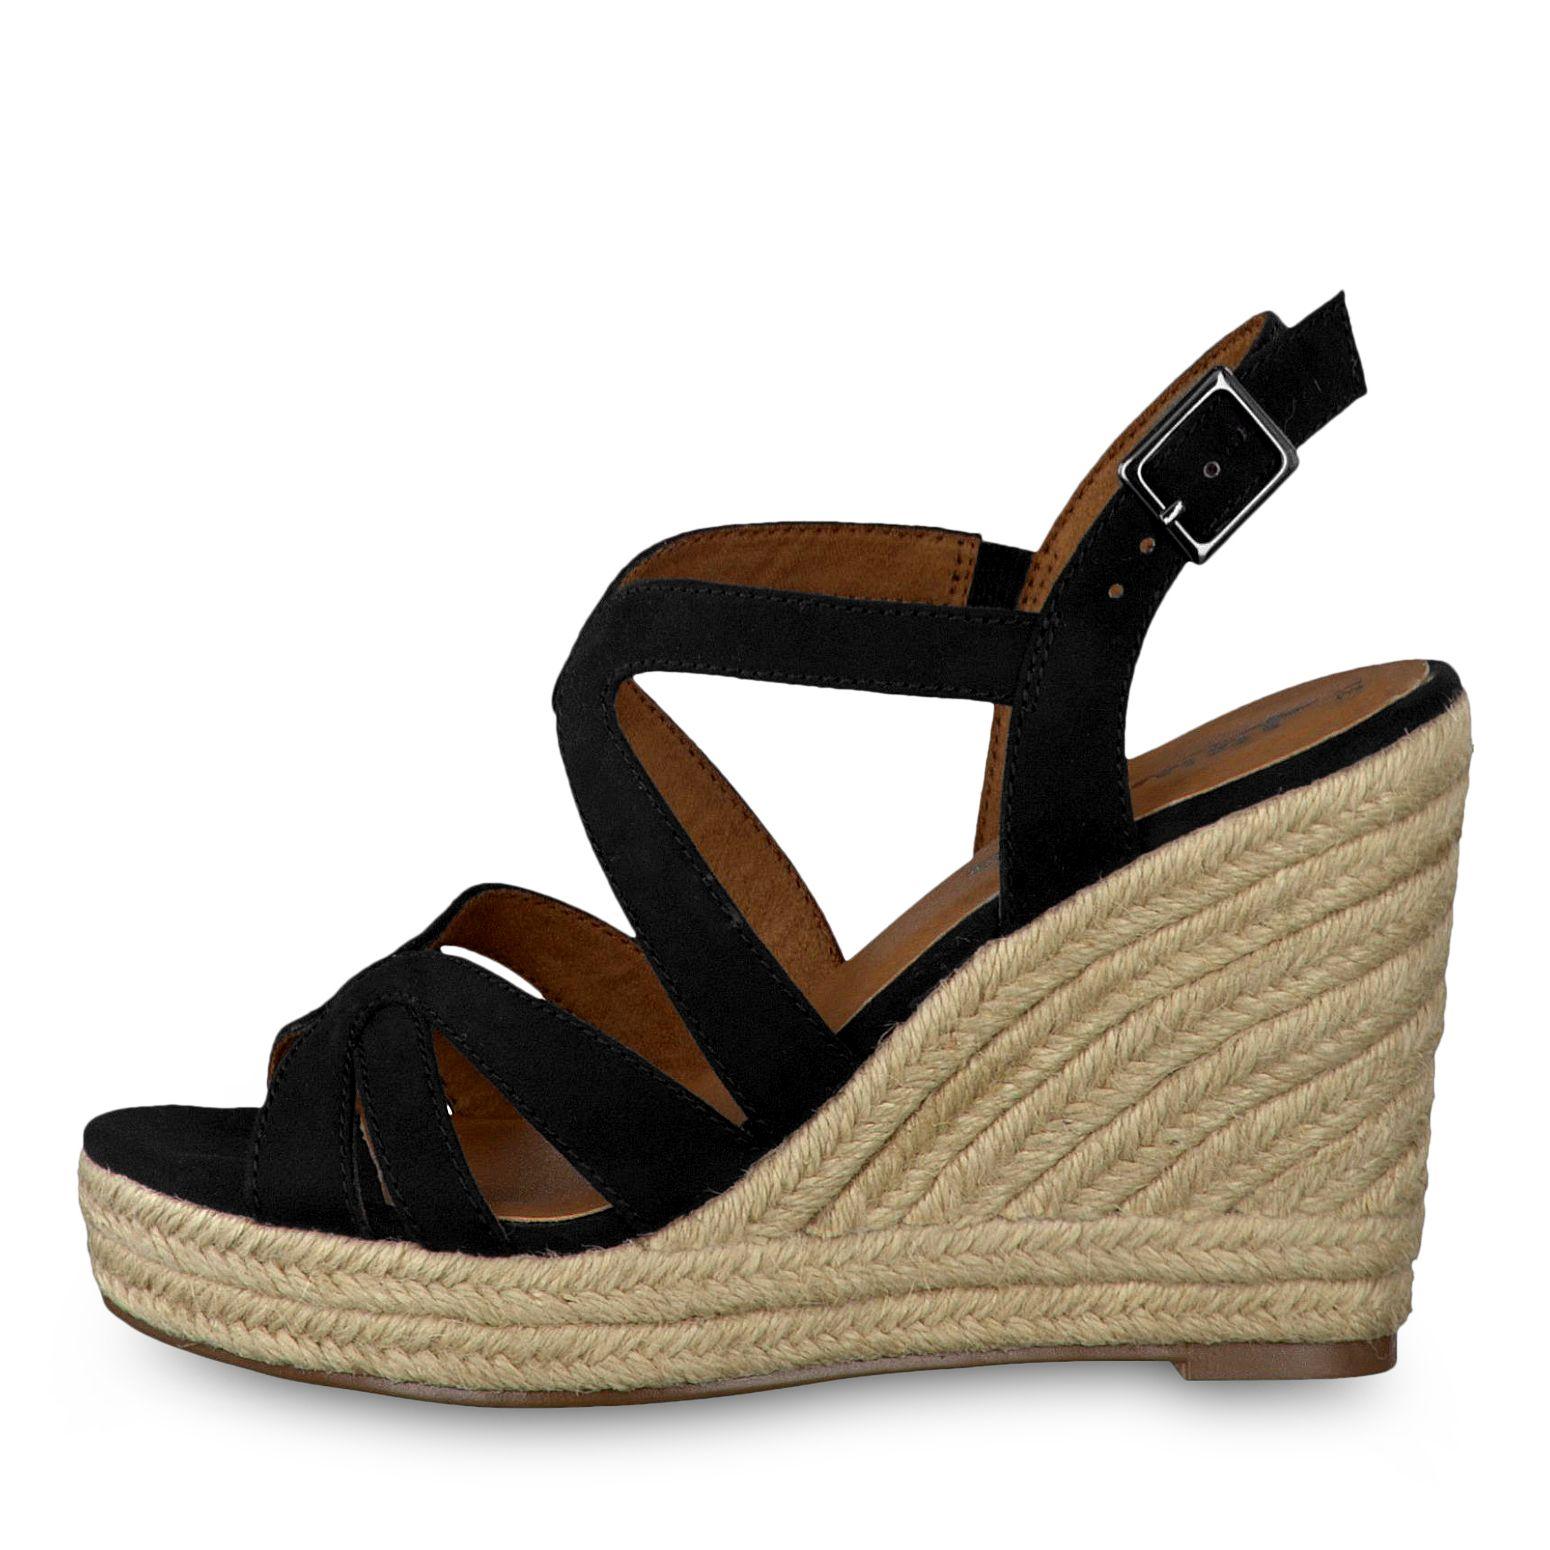 cynara 1 1 28342 28 tamaris sandaletten online kaufen. Black Bedroom Furniture Sets. Home Design Ideas